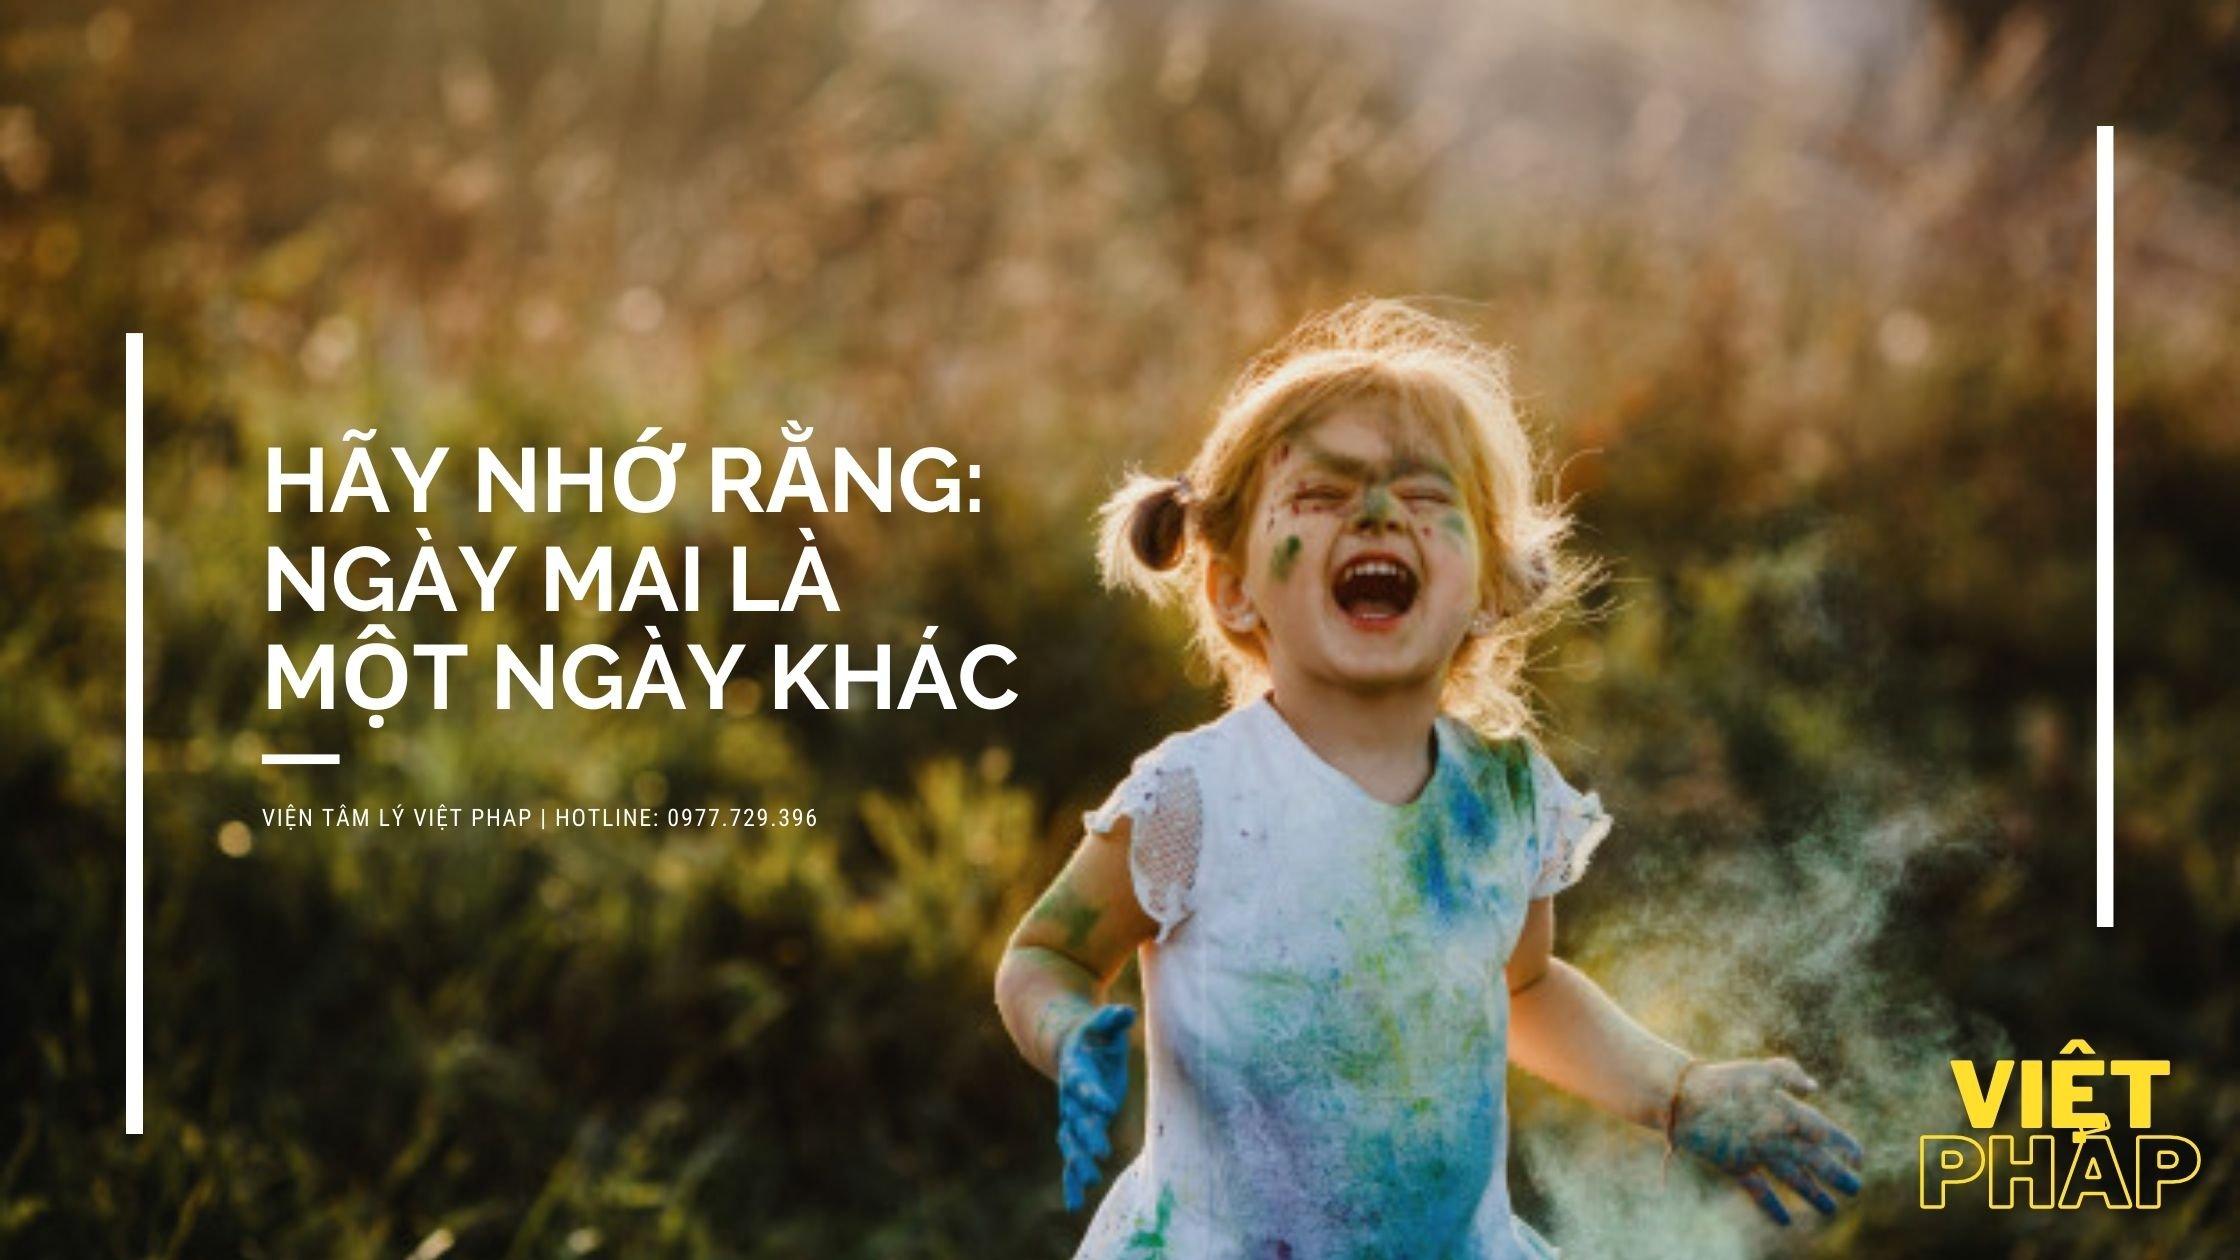 Hay_nho_rang_ngay_mai_la_mot_ngay_khac